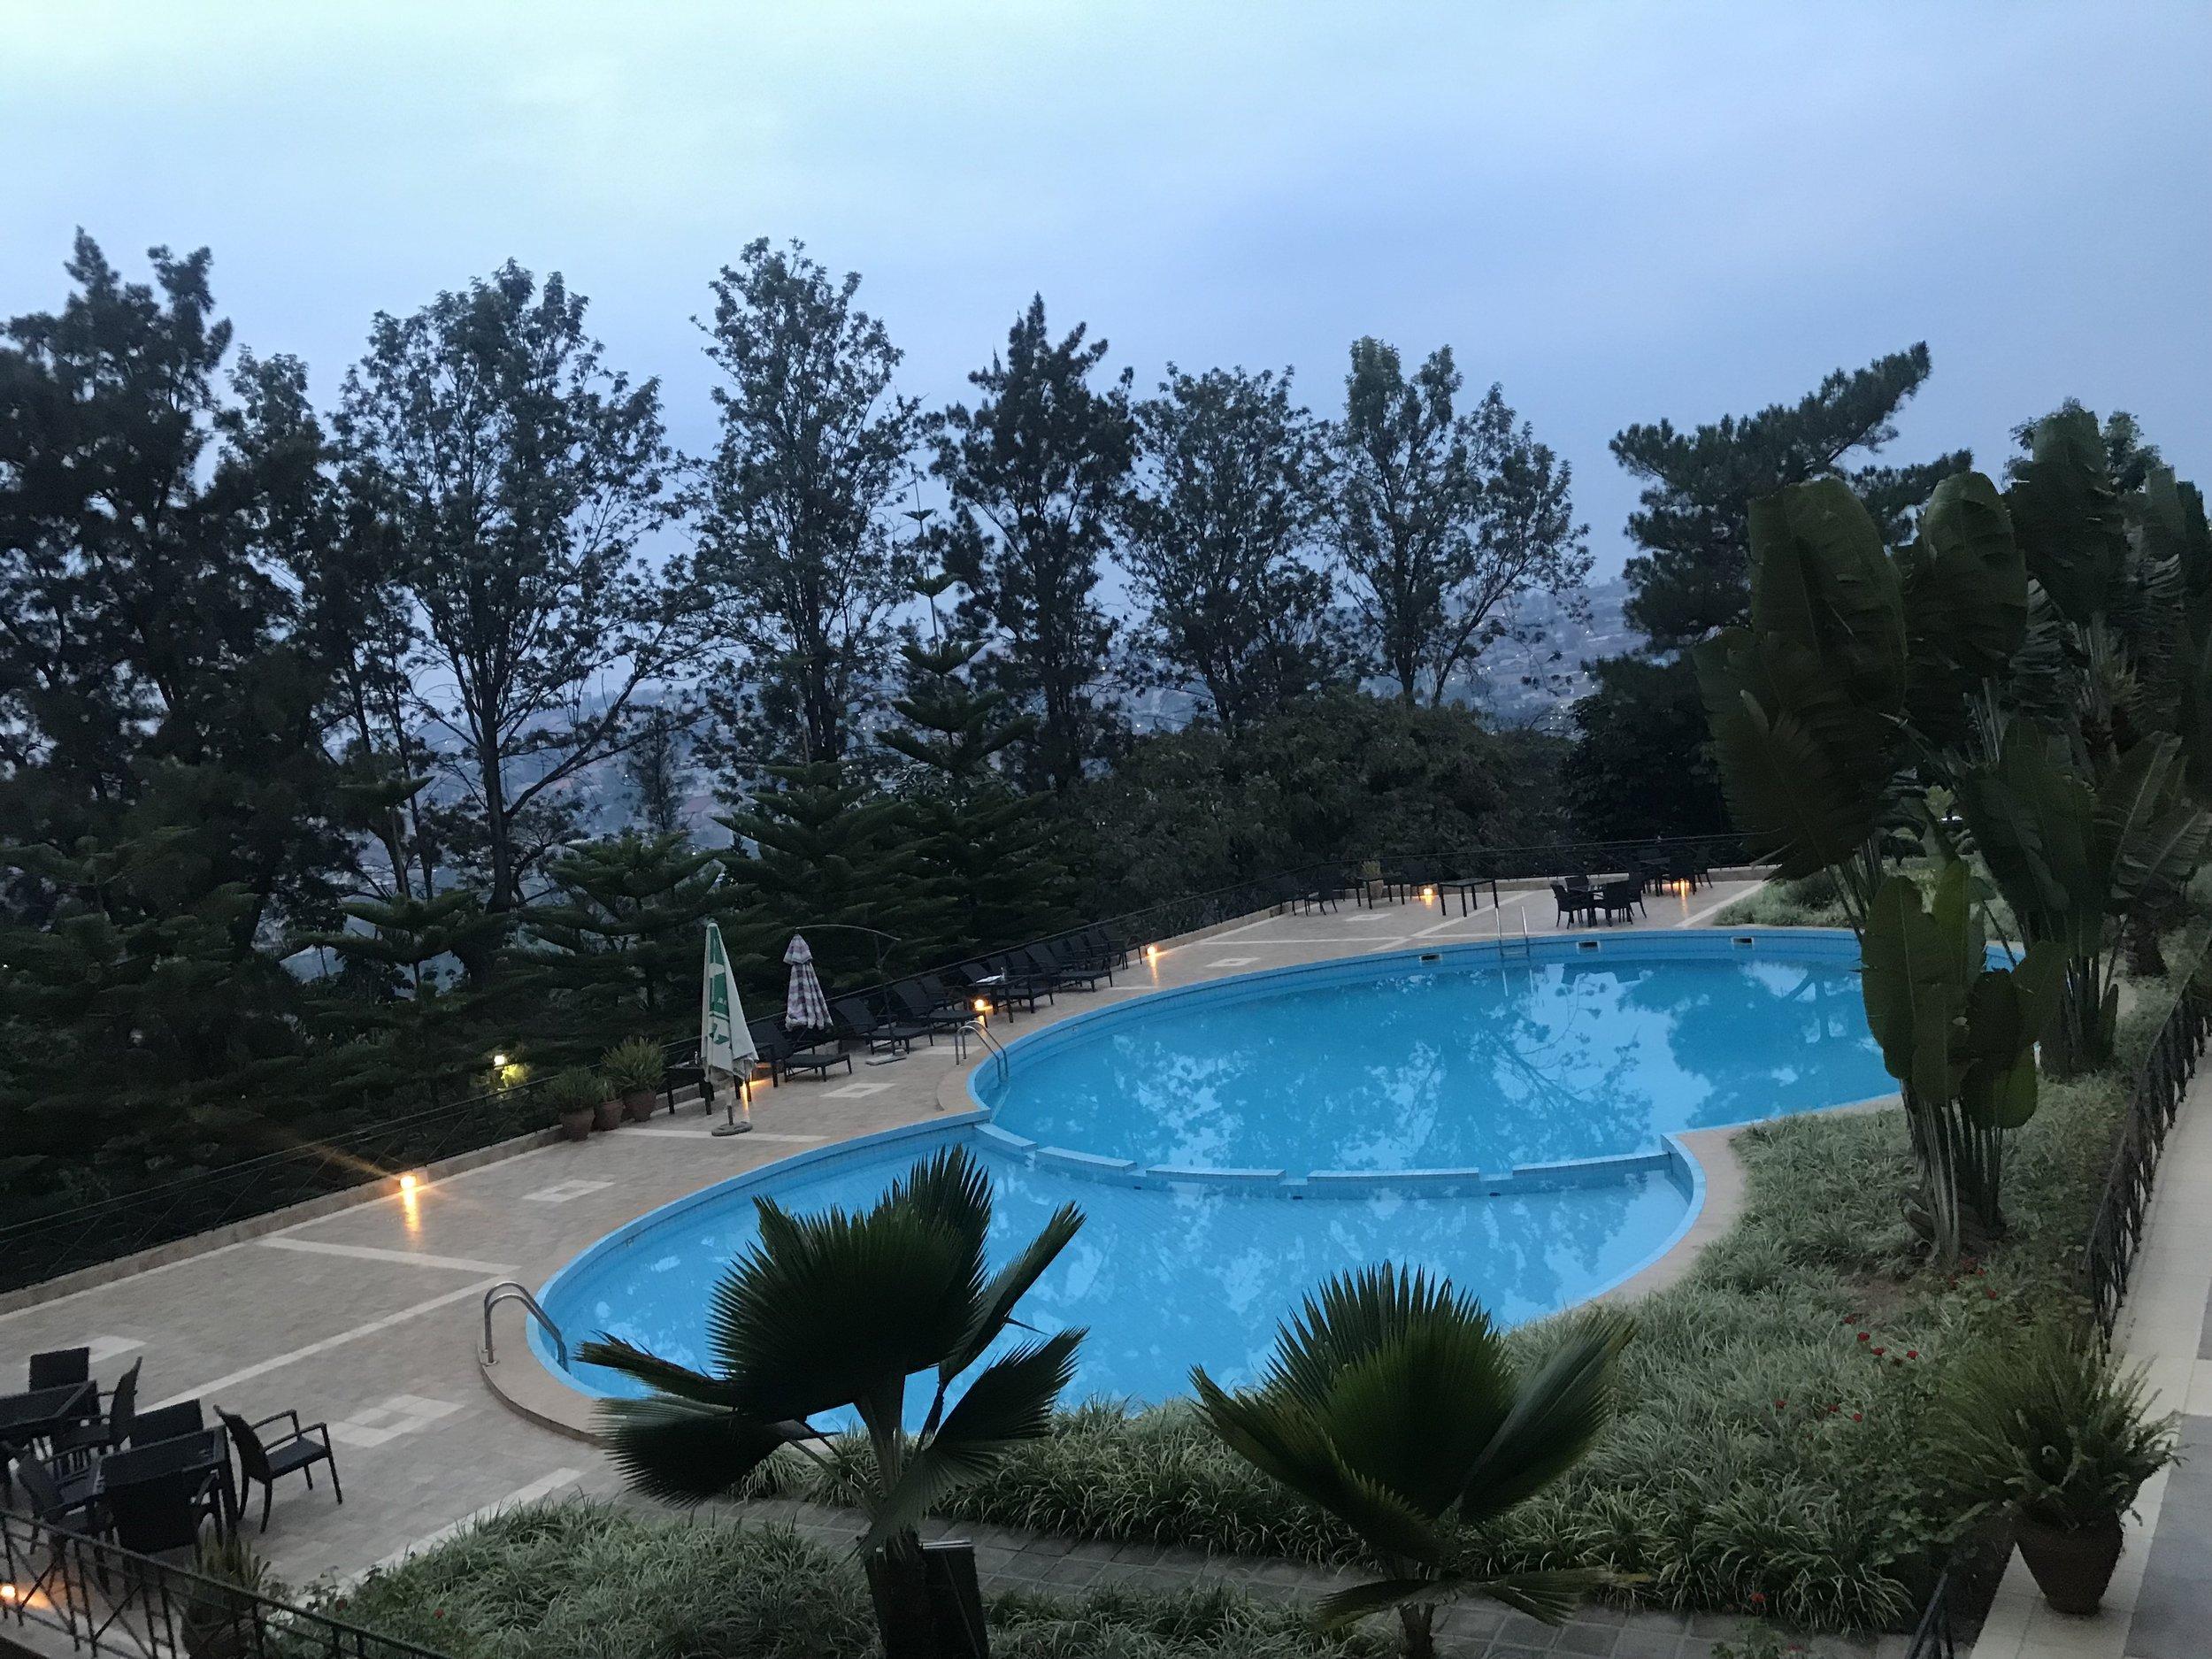 IMG_6249 2VickieRemoe-travel-kigali-rwanda-review-kwibohora25-hotels-africa.JPG